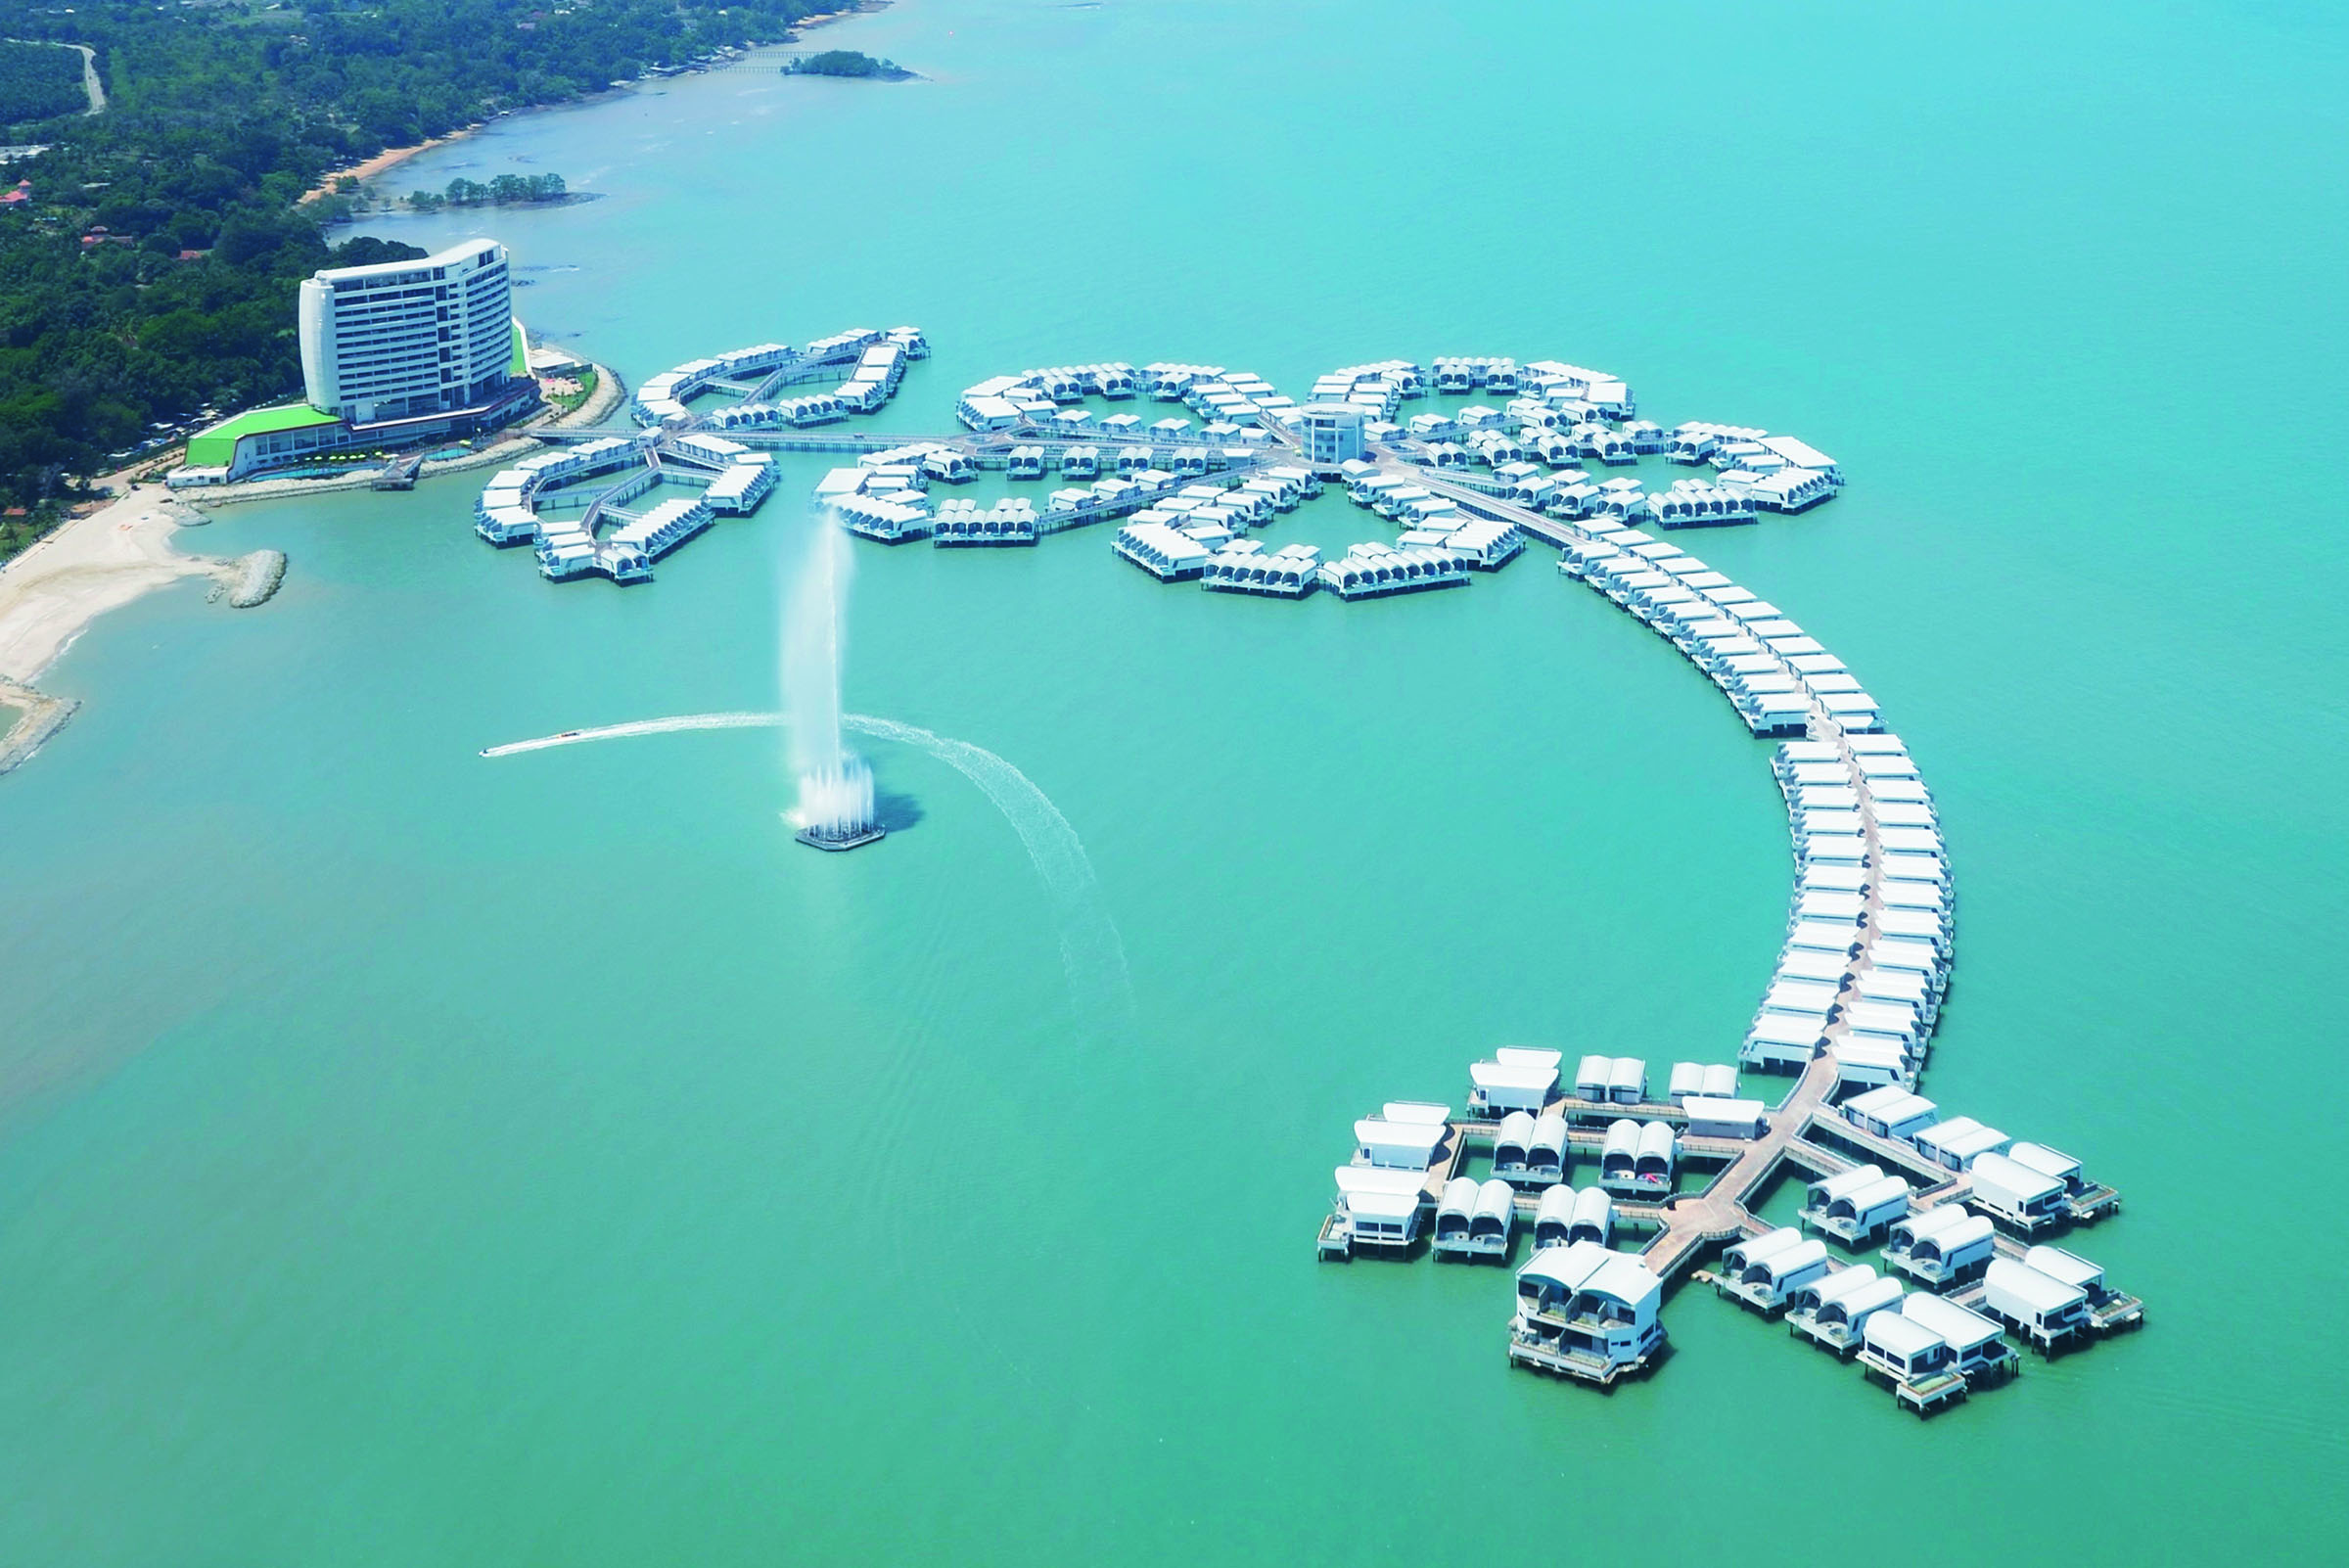 AC. Exterior - Aerial View of the Resort (iii).jpg